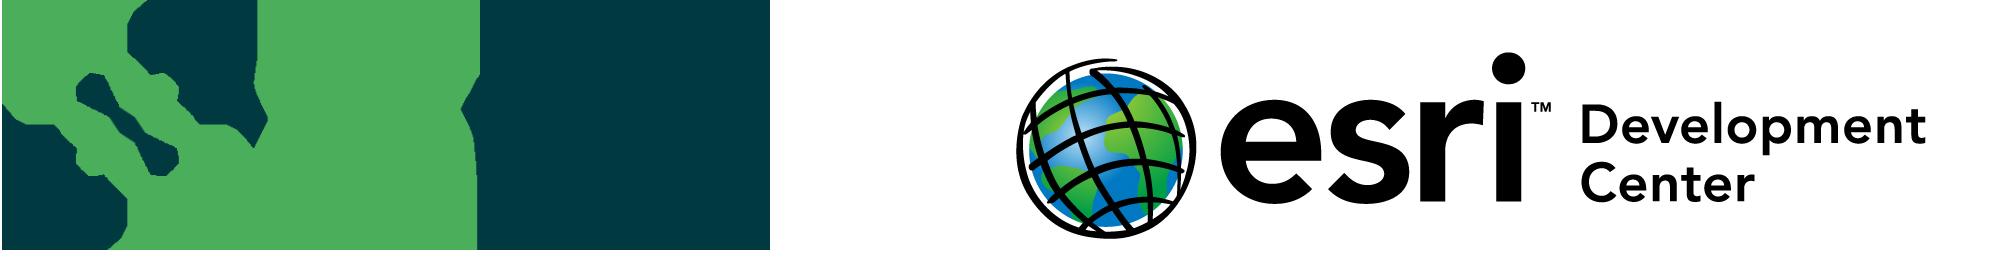 OSGeo and EDC logos